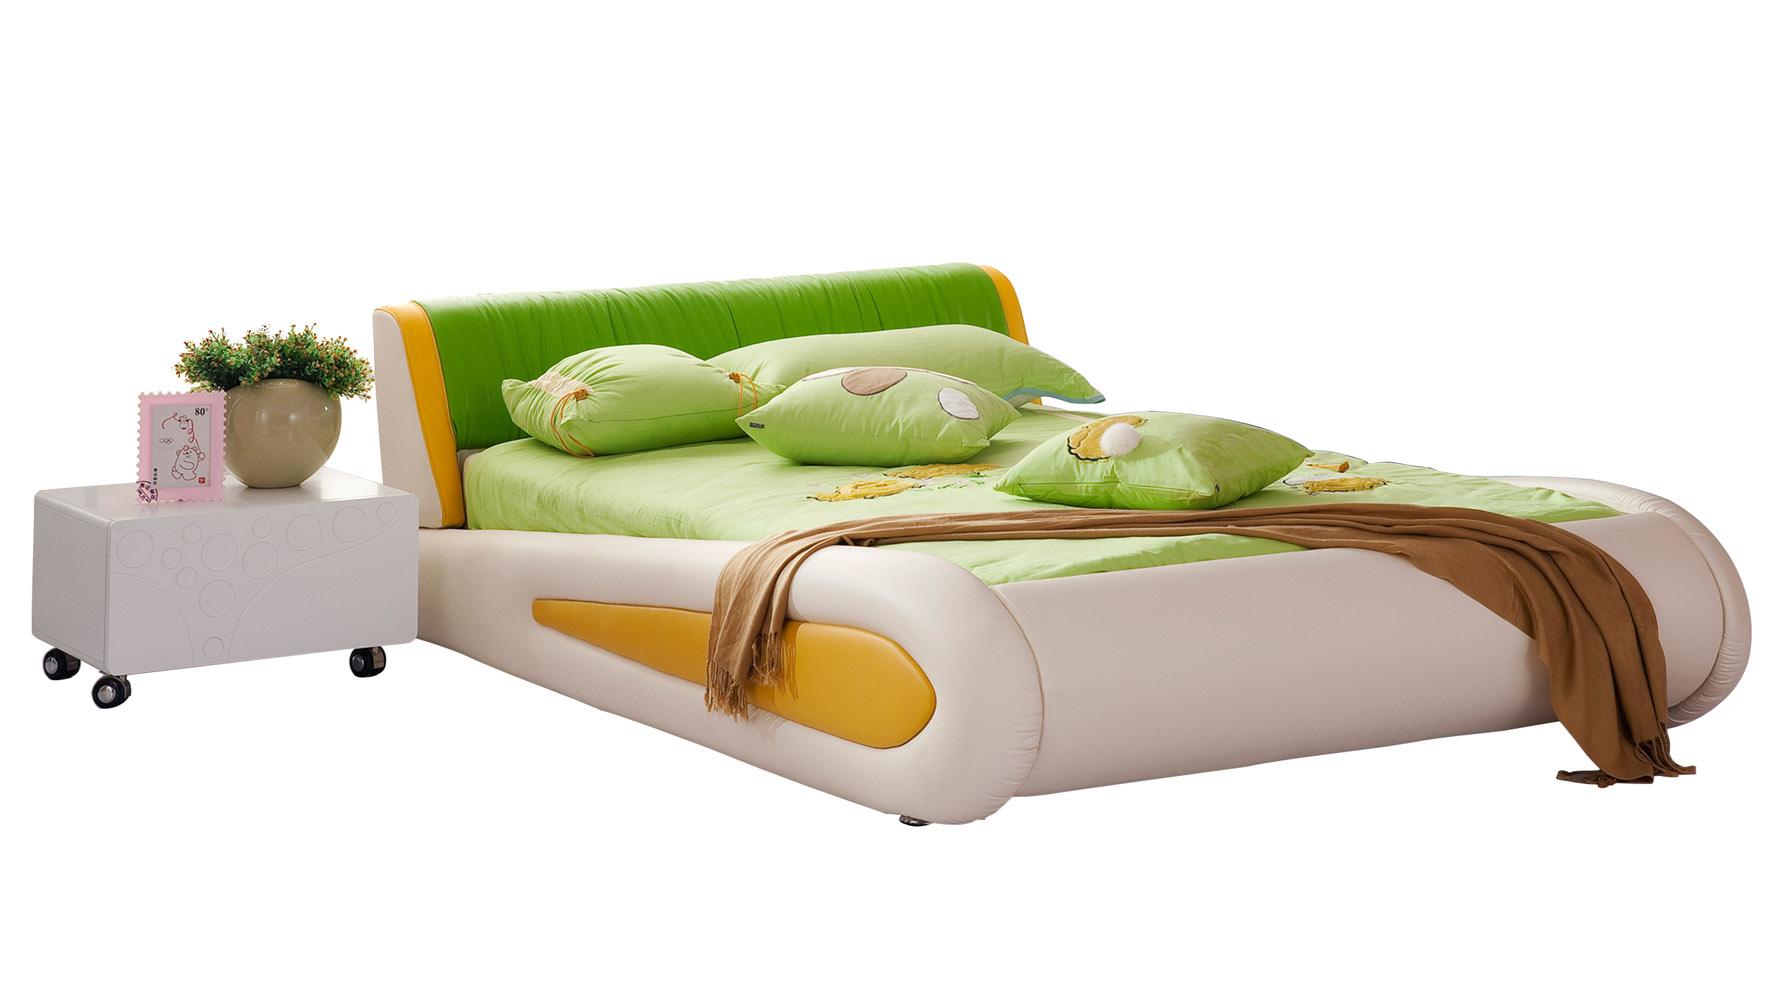 Green Leather Kermit Kids Frog Bed Zuri Furniture : kermitgreenleatherkidsfrogbed 2 from www.zurifurniture.com size 1778 x 1000 jpeg 182kB